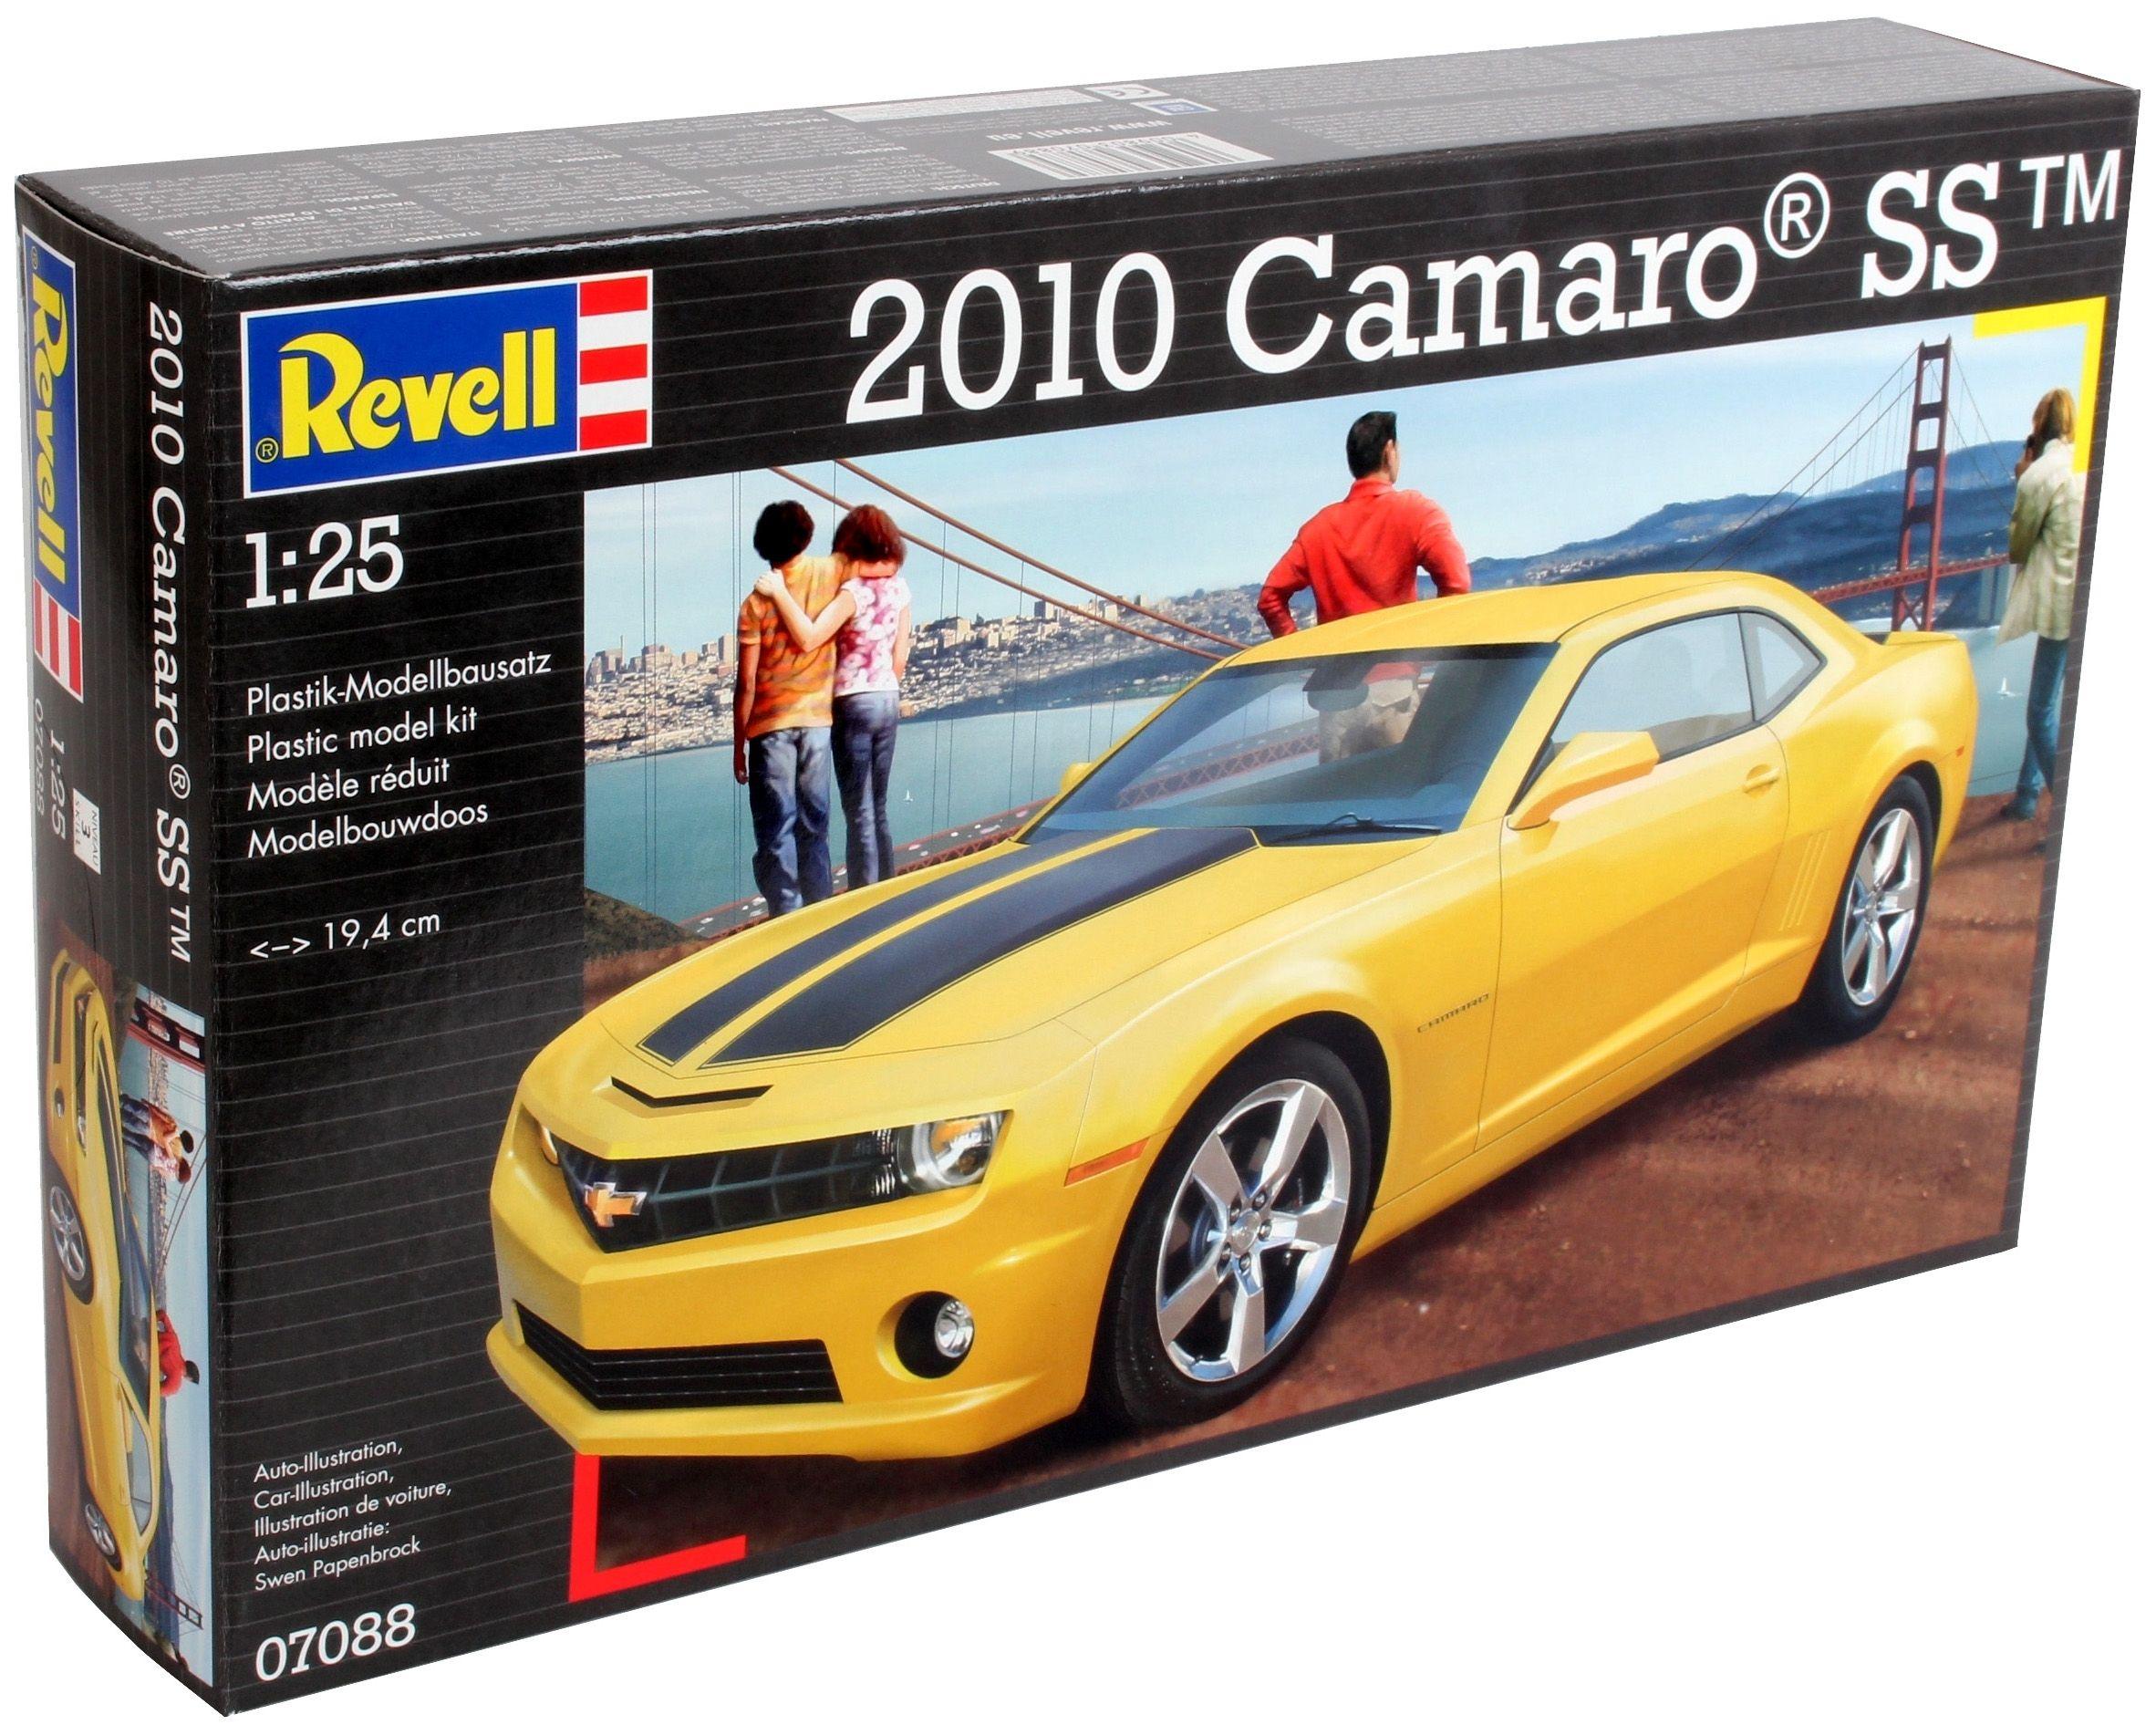 Сглобяем модел на автомобил Revell -2010 Camaro SS (07088) - 6